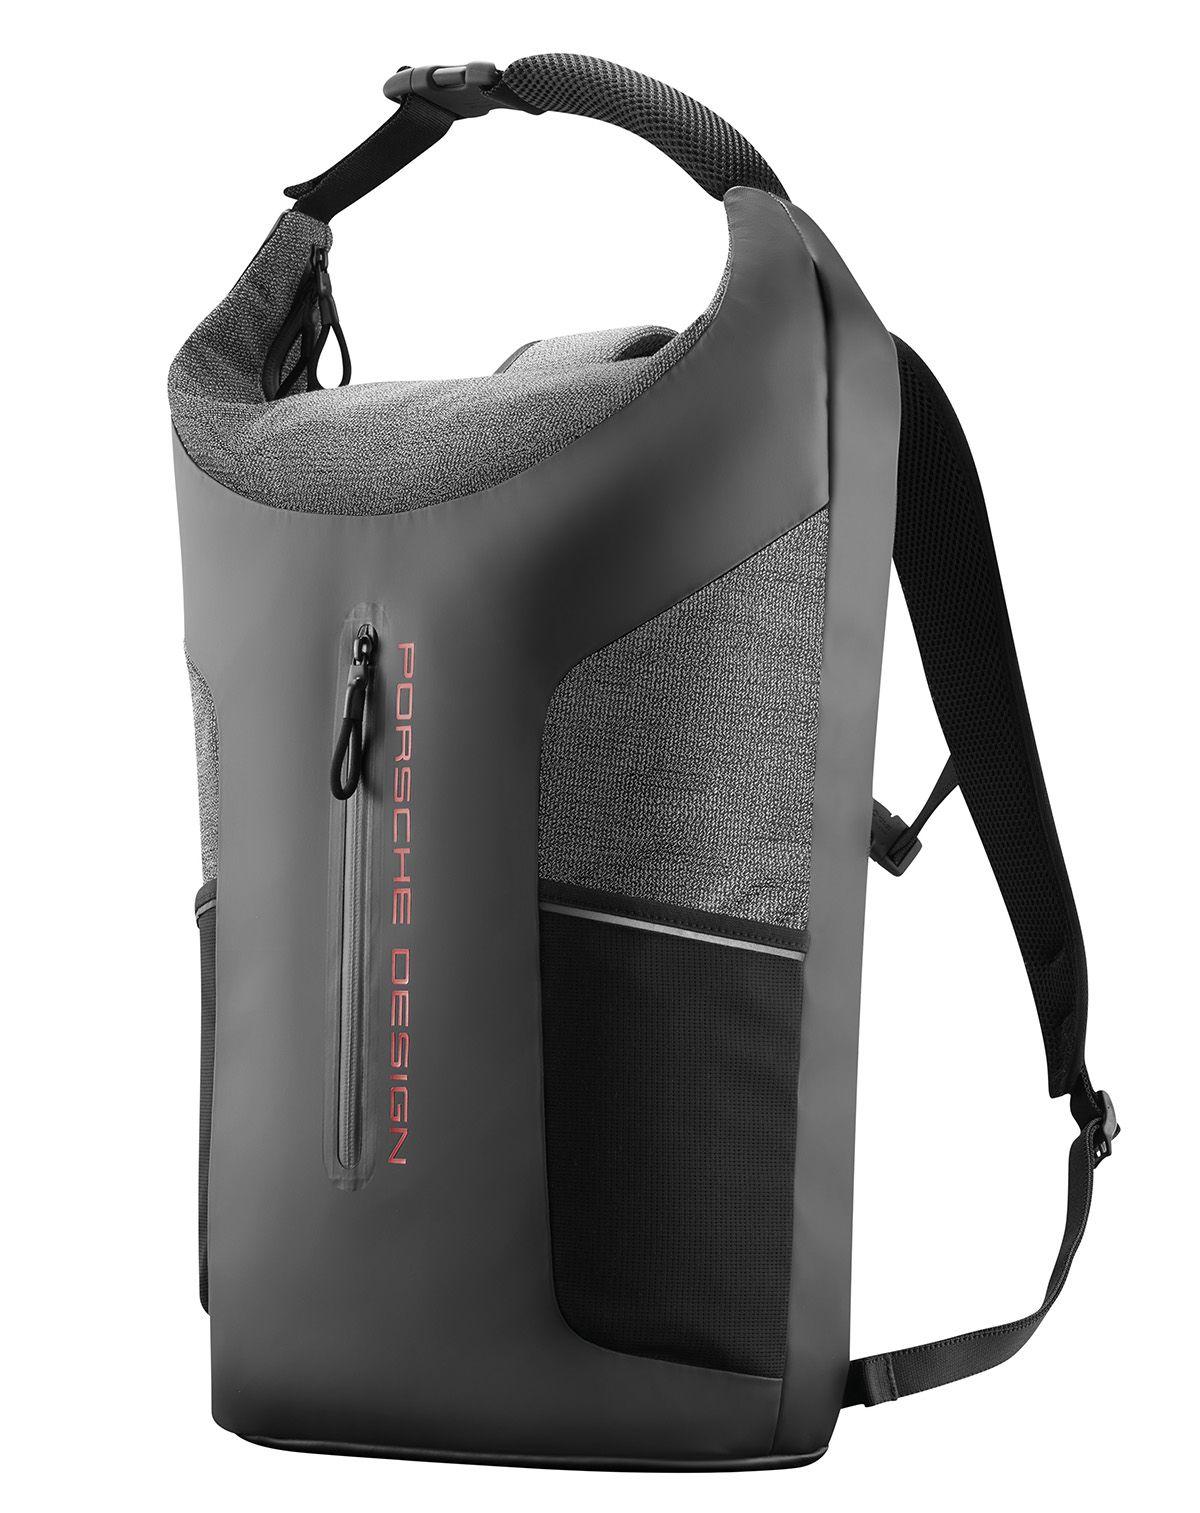 Adidas load spring рюкзак станковый рюкзак шведск